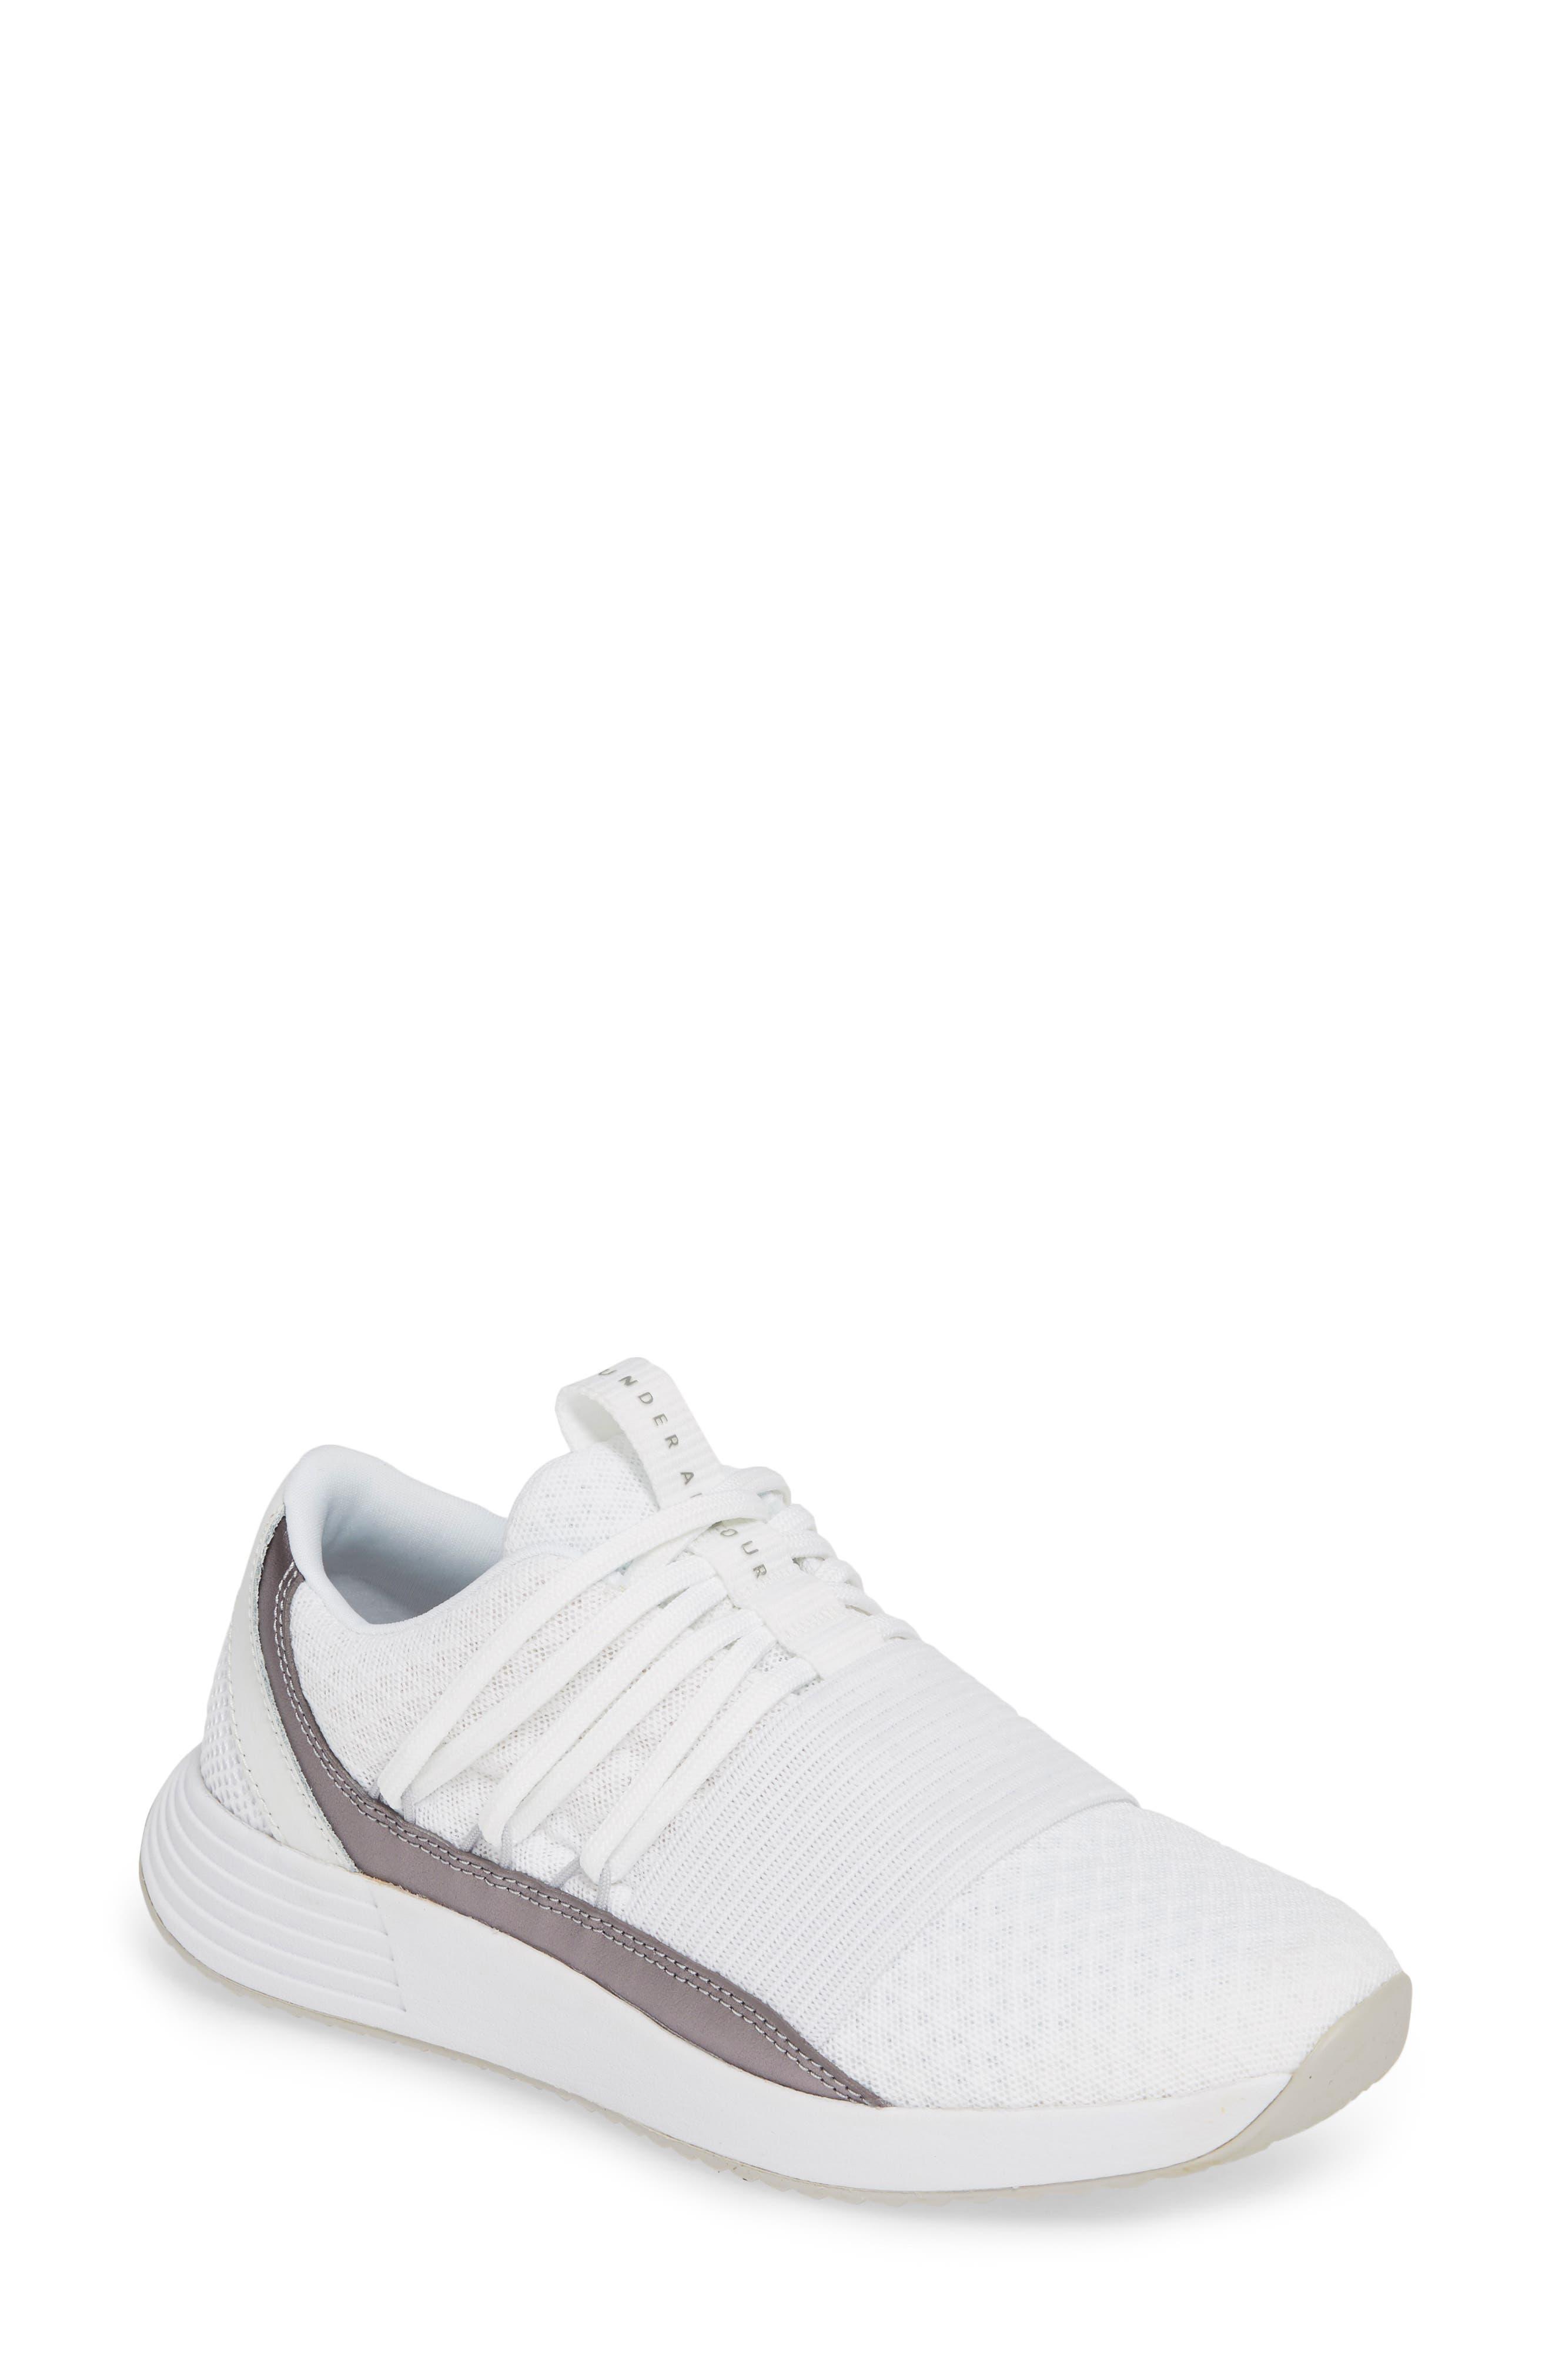 UNDER ARMOUR Breathe Lace X NM Sneaker, Main, color, WHITE/ WHITE/ METALLIC BLUSH